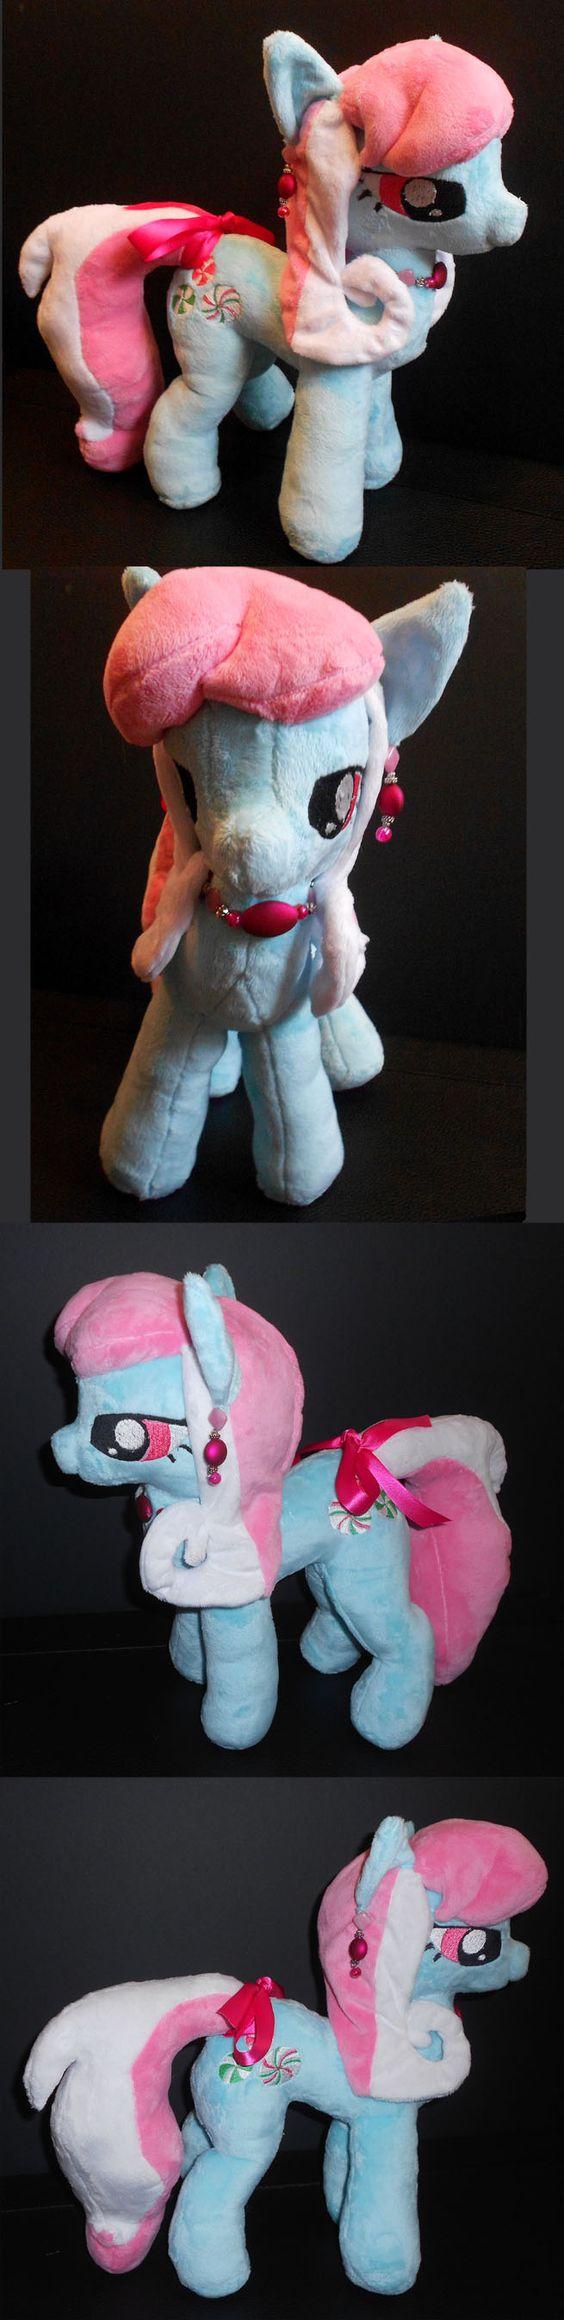 My Little Pony Minty Custom Plush by Sophillia.deviantart.com on @DeviantArt